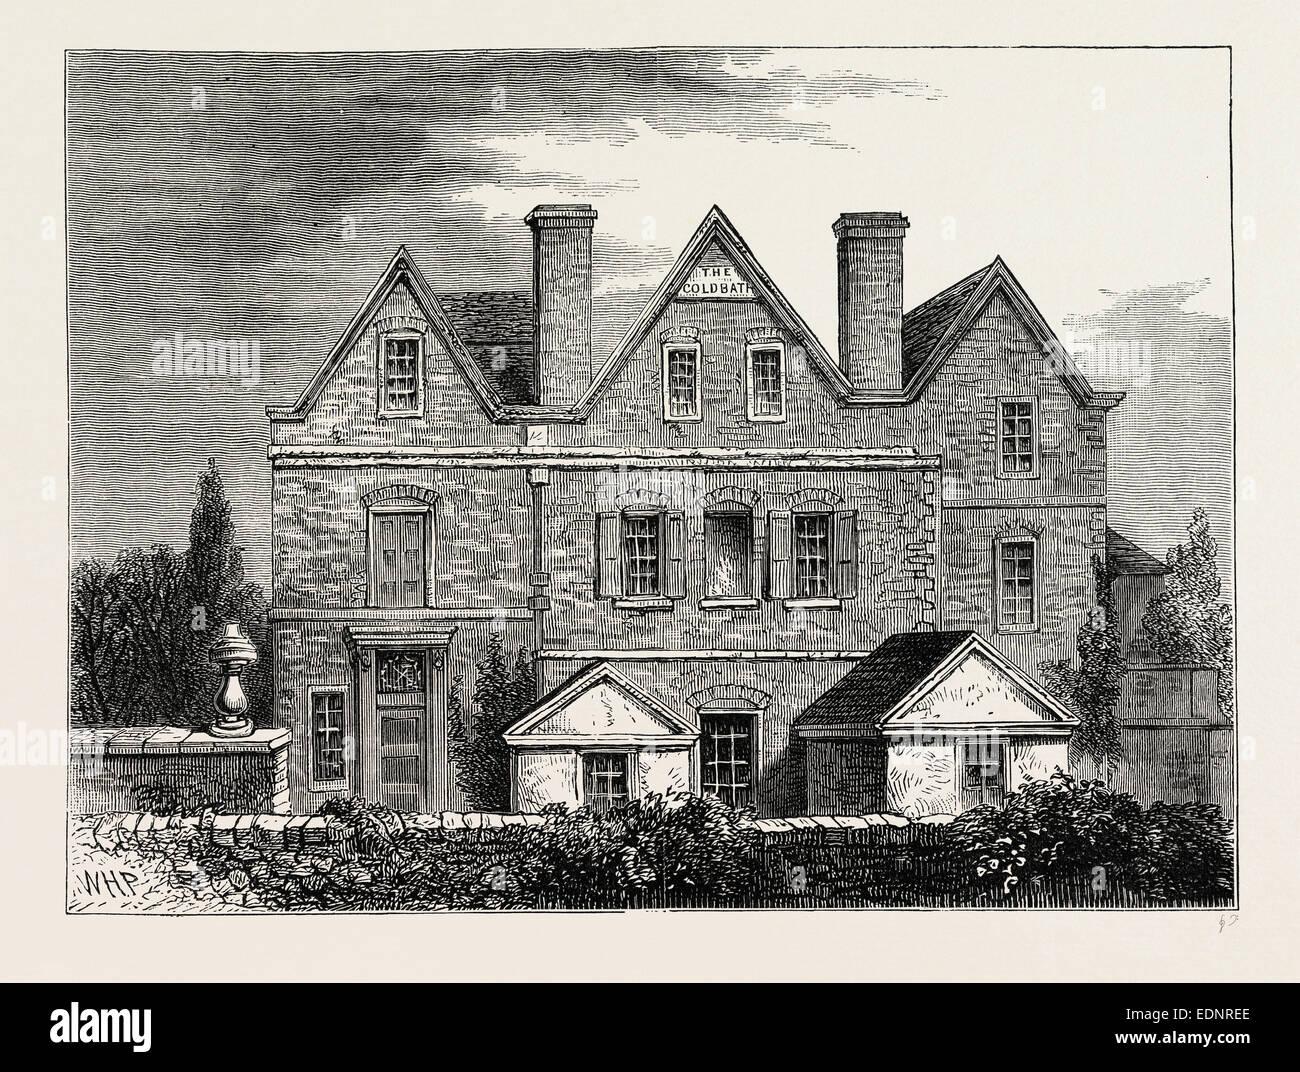 Coldbath House, 1811, London, UK, 19th century engraving - Stock Image